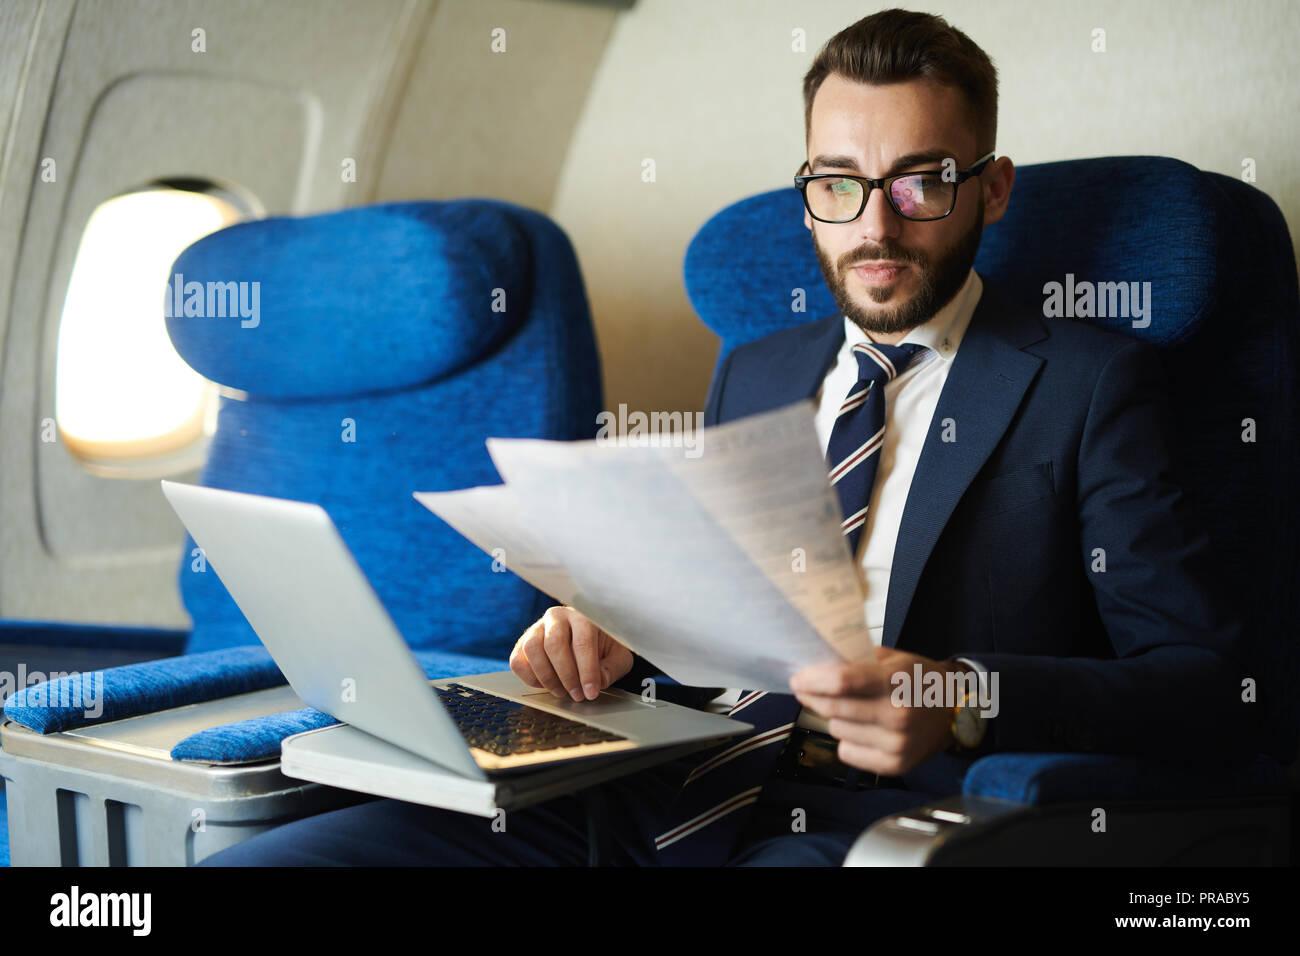 Stattliche Business Mann arbeitet in der Ebene Stockbild